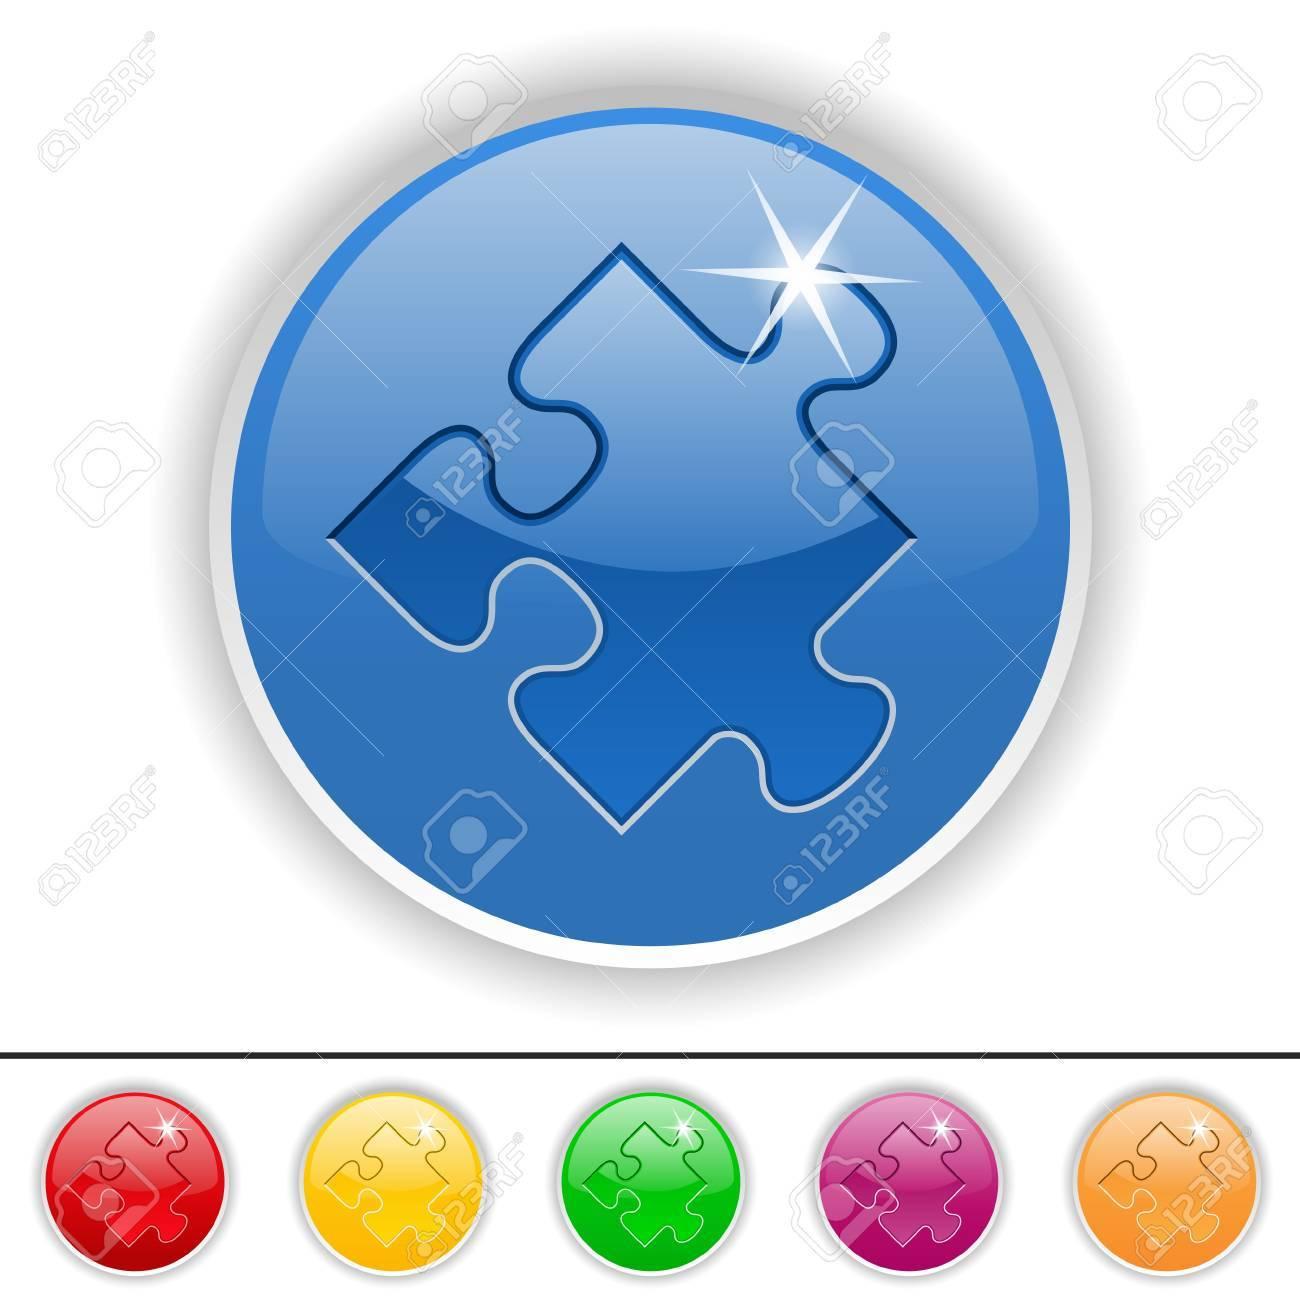 Puzzle piece icon, vector illustration Stock Vector - 11030280